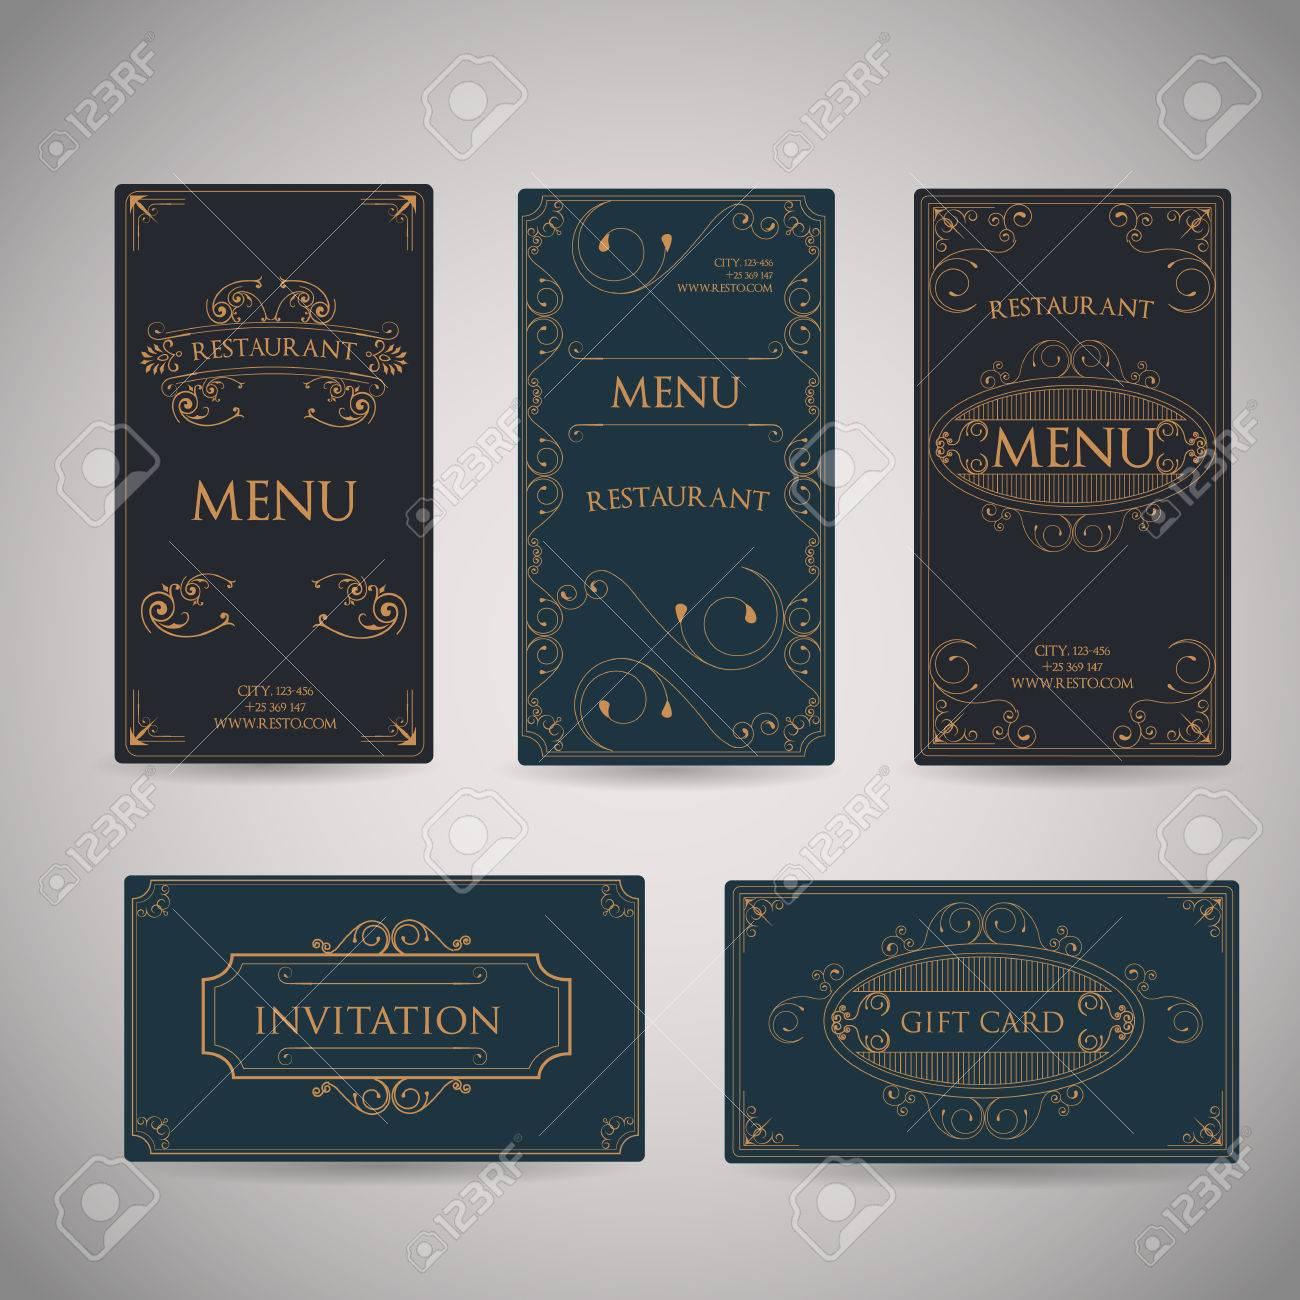 Set Of Vintage Luxury Greeting Restaurant Menu Design Template ...